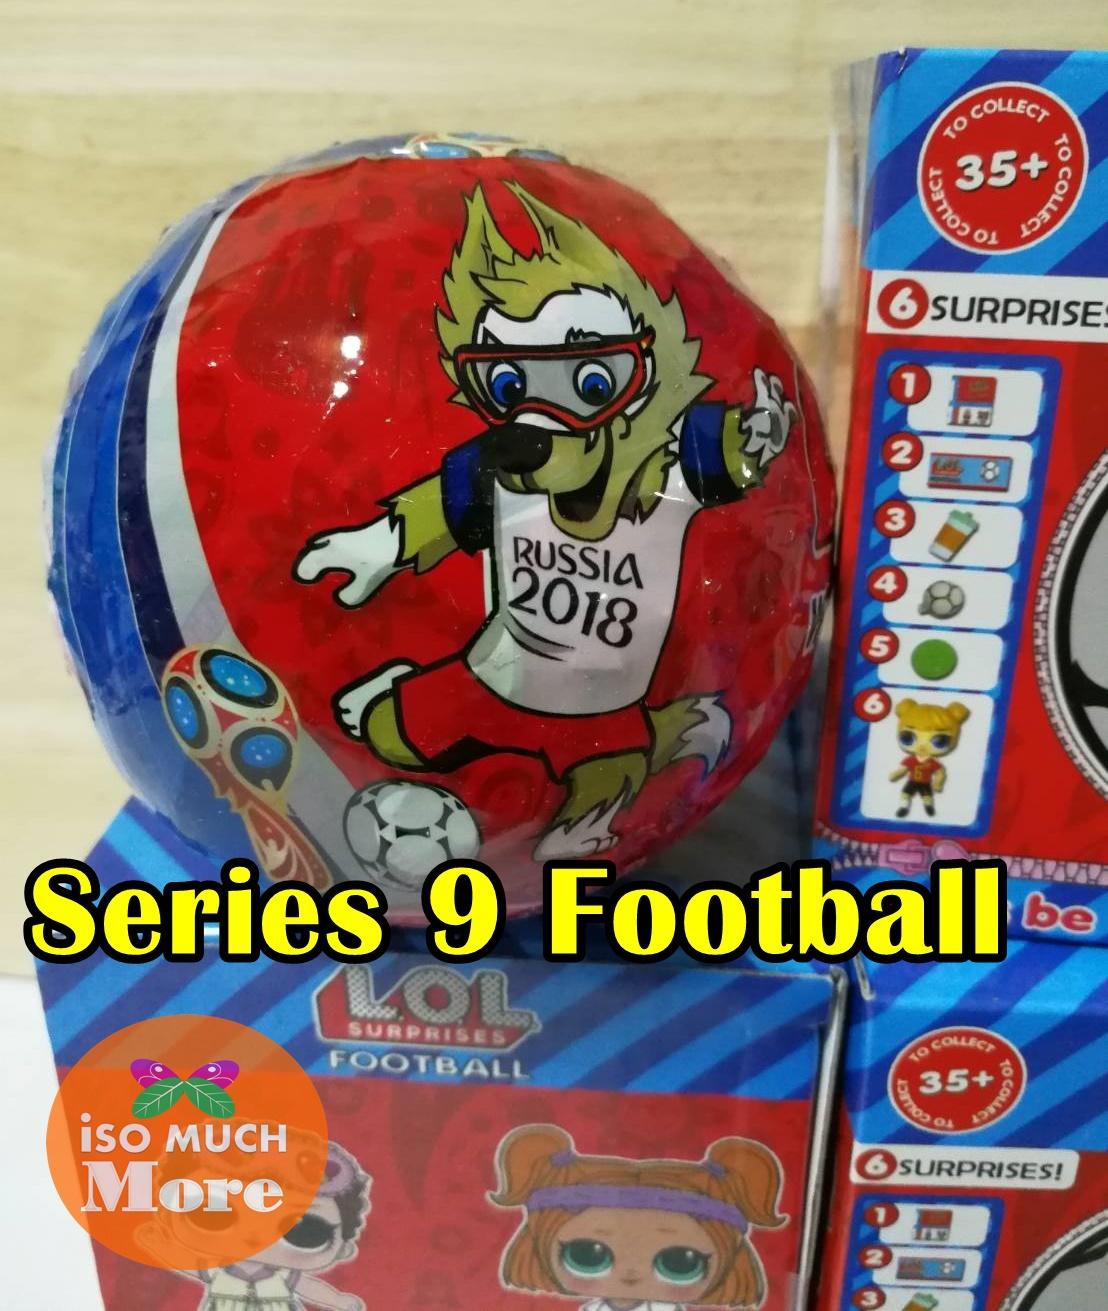 LOL Surprise Series 9 Football WORLD CUP 2018 (แพ็ค1ลูก)